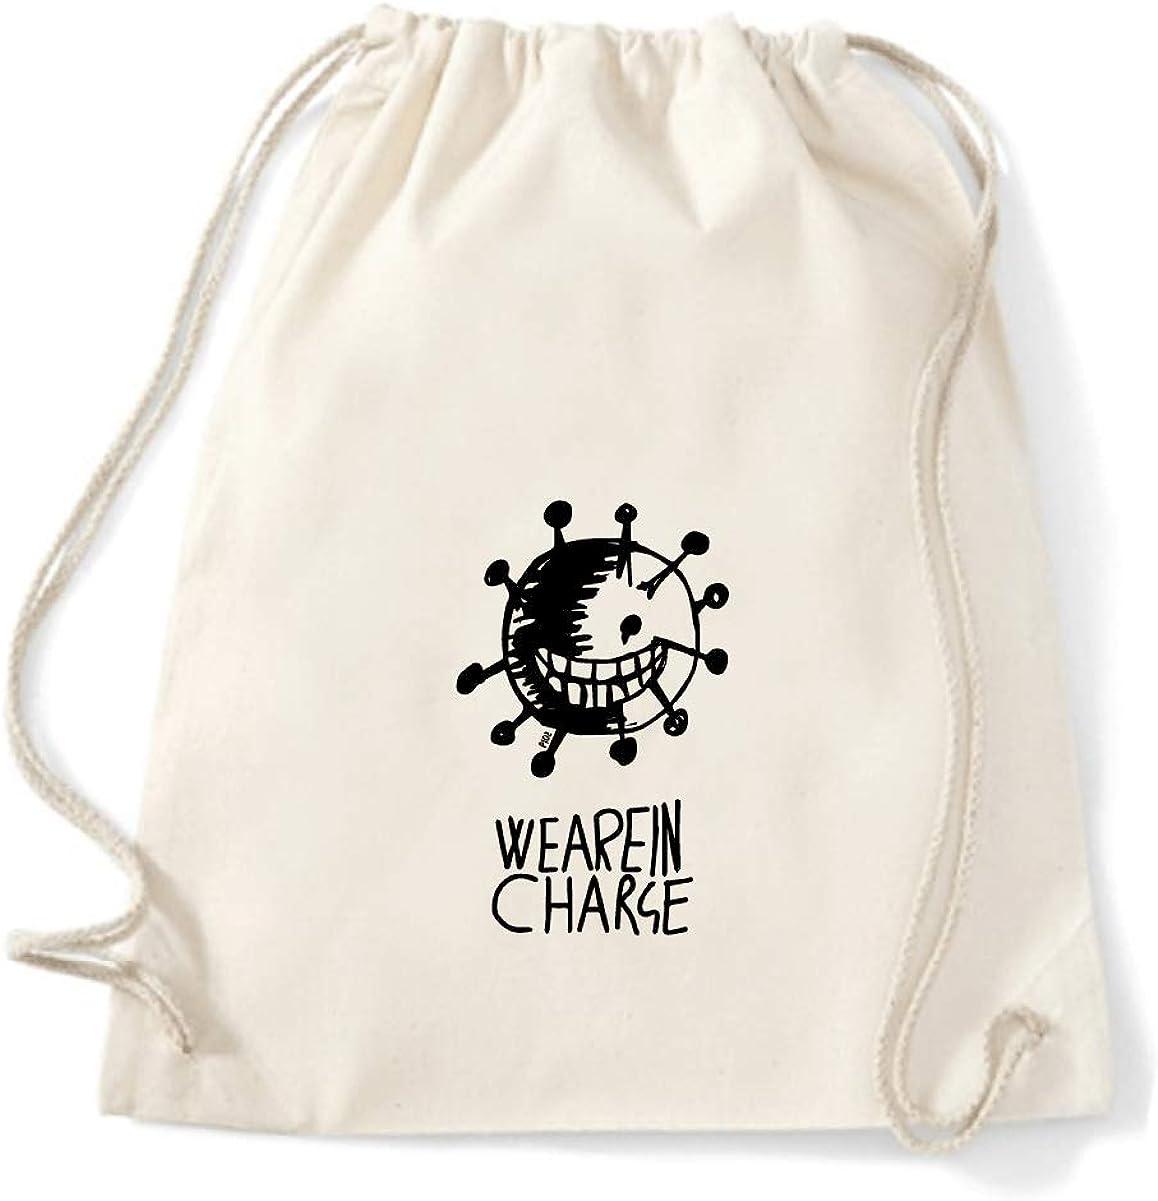 Art T-shirt, mochila bolsa We are Charge, bolsa Gym